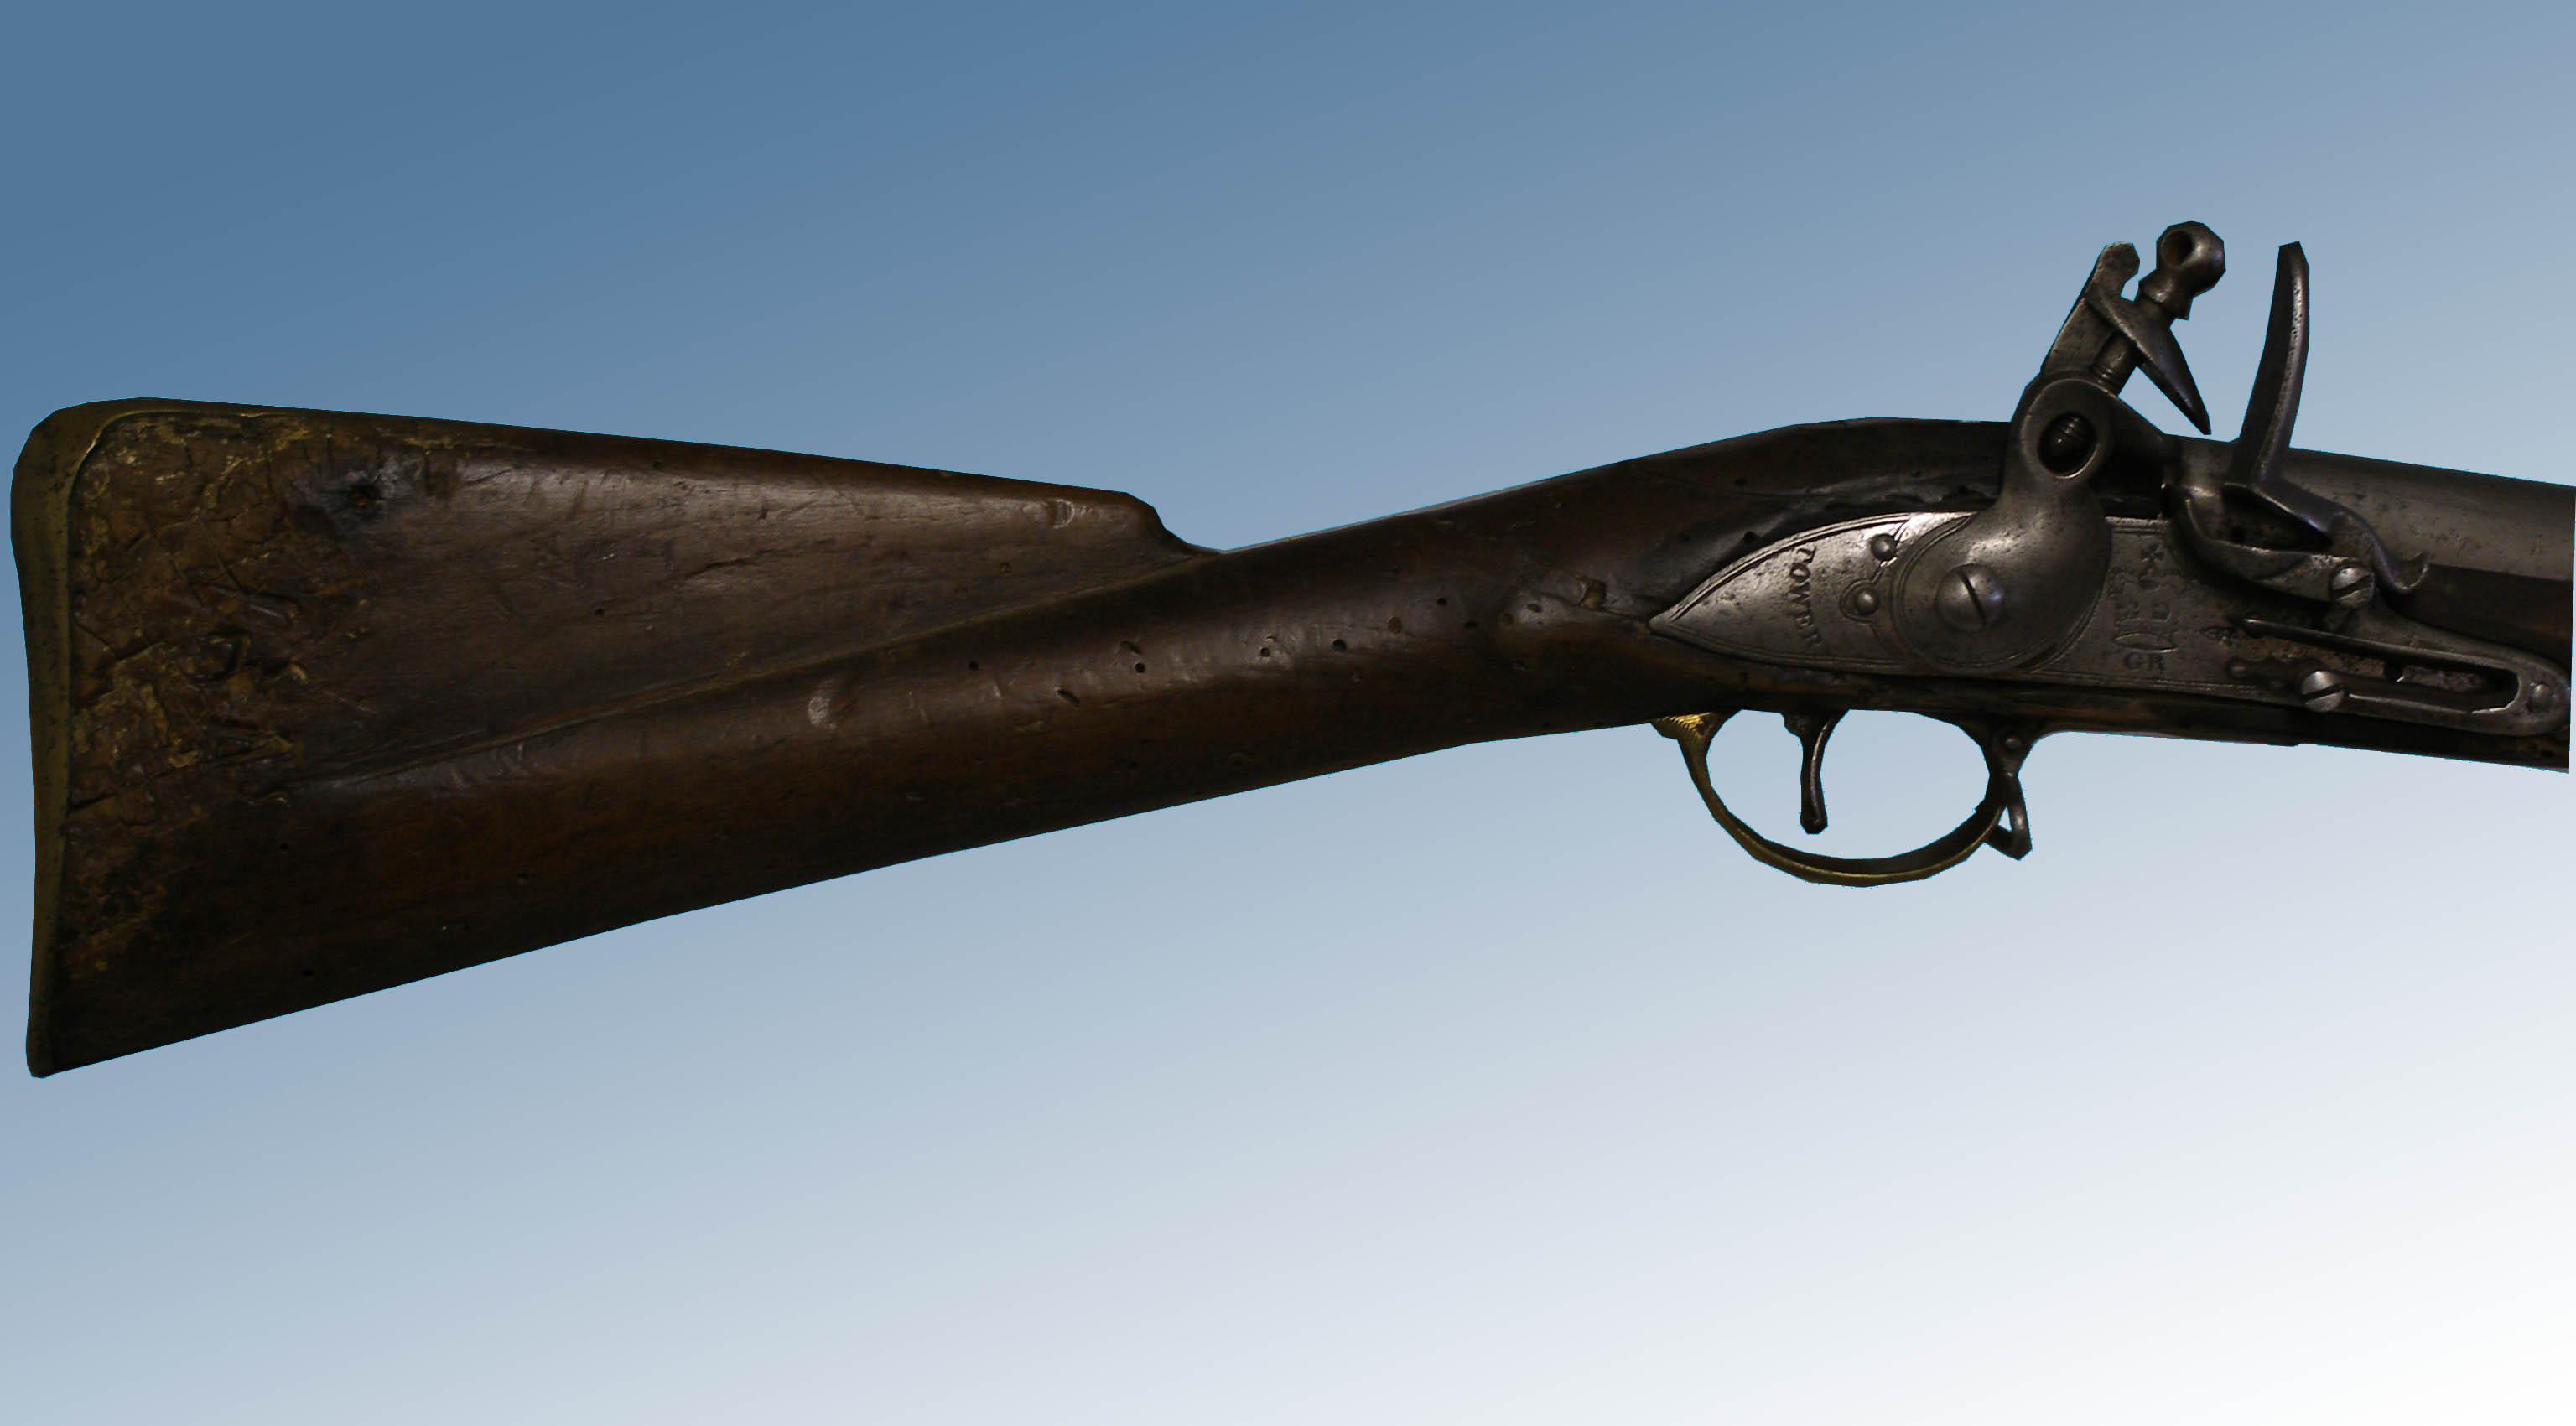 Fusil inglés Tower modelo de 1809